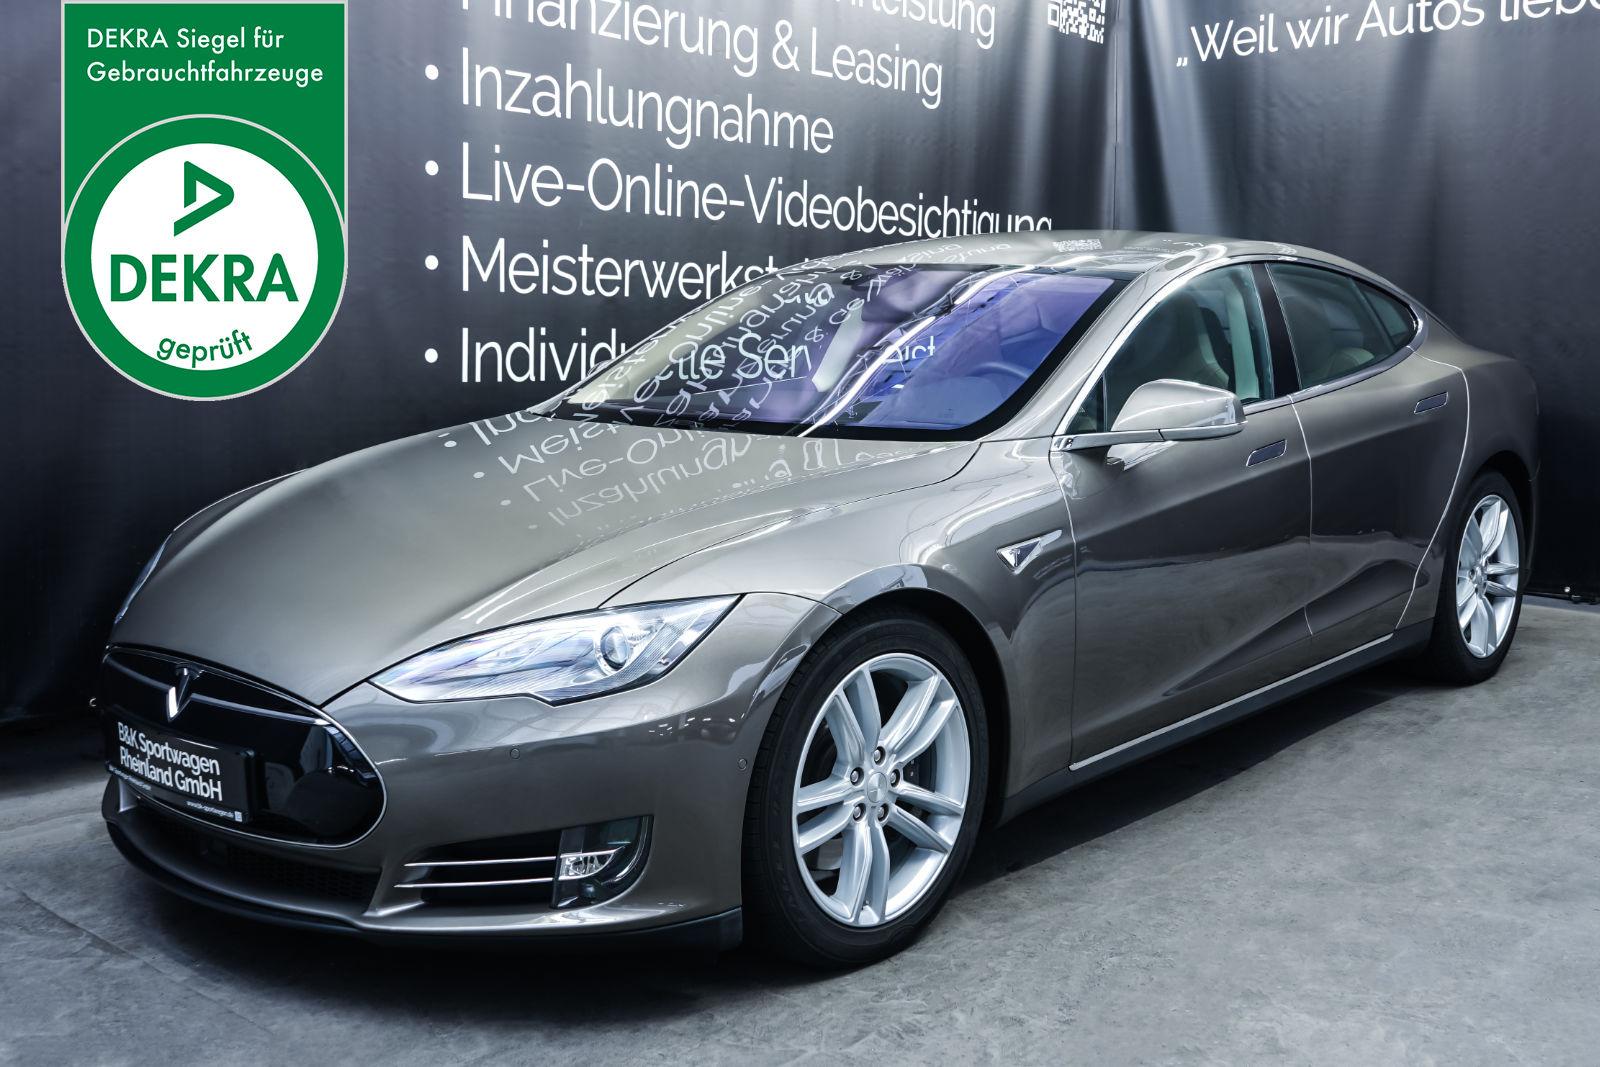 Tesla_ModelS85D_TitaniumMetallic_Beige_Tes-2897_Plakette_w